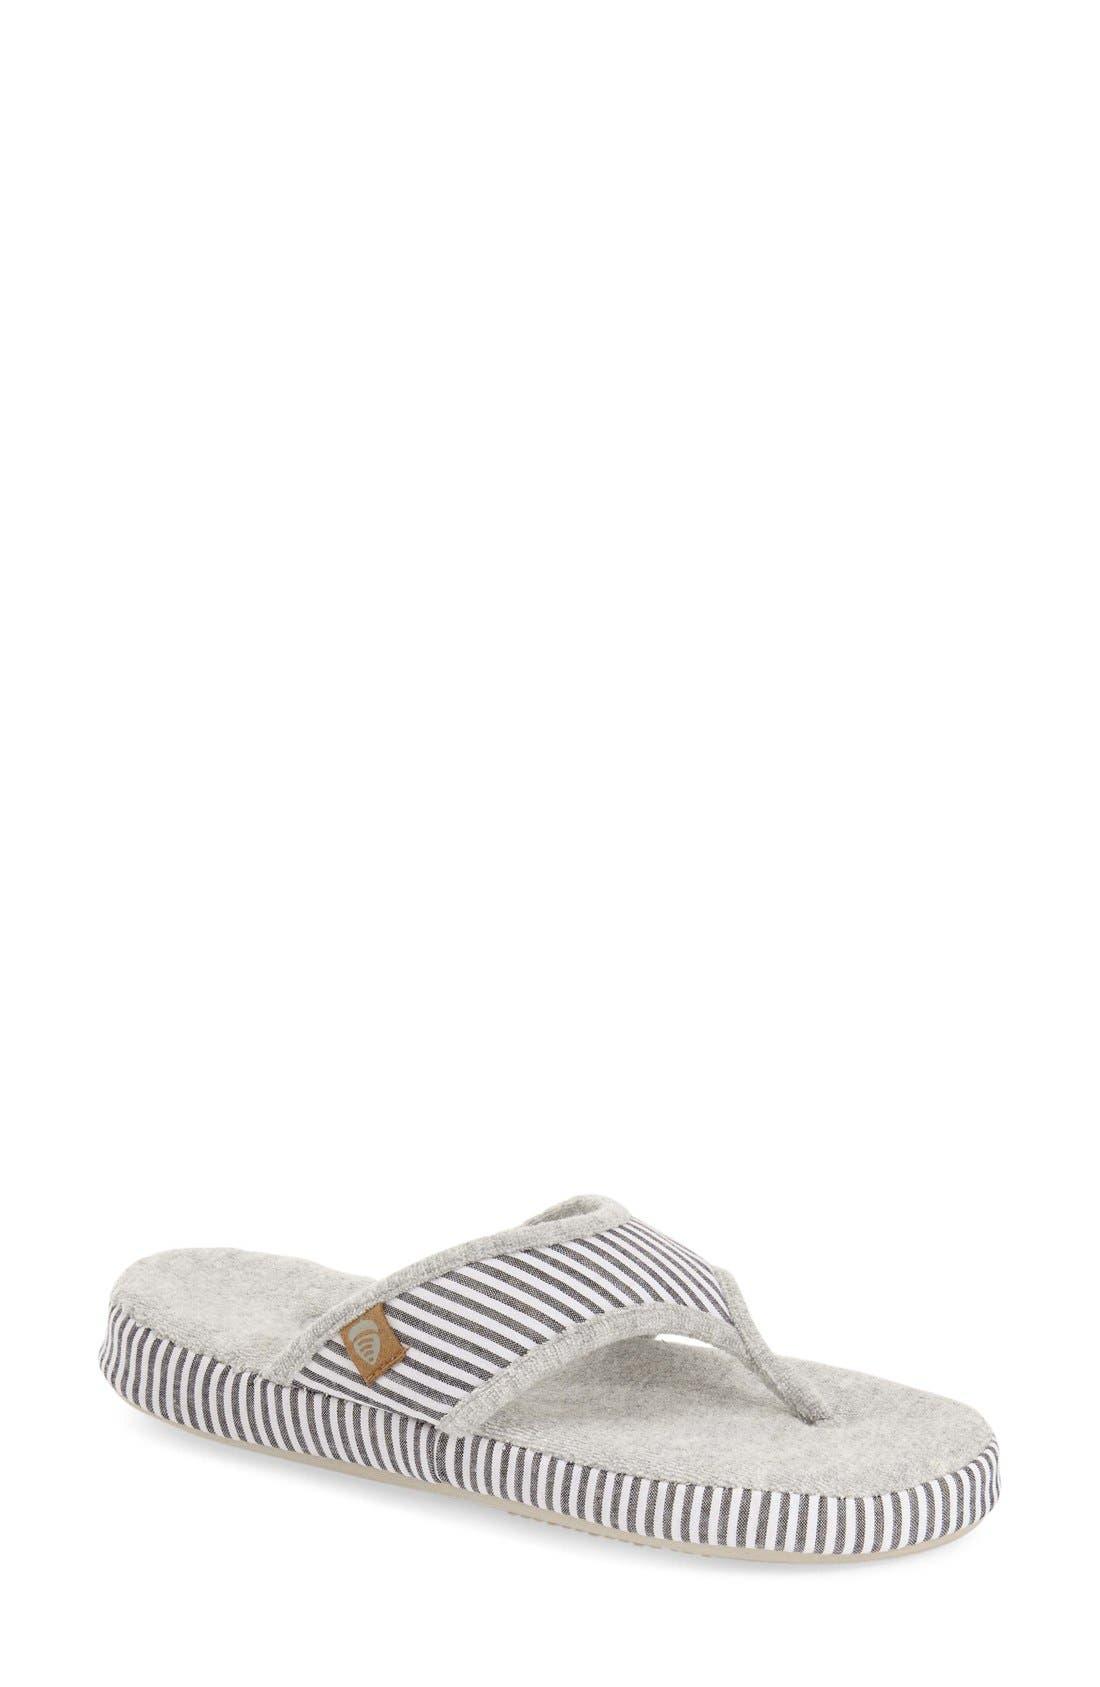 'Summerweight' Slipper,                         Main,                         color, Grey Strip Fabric